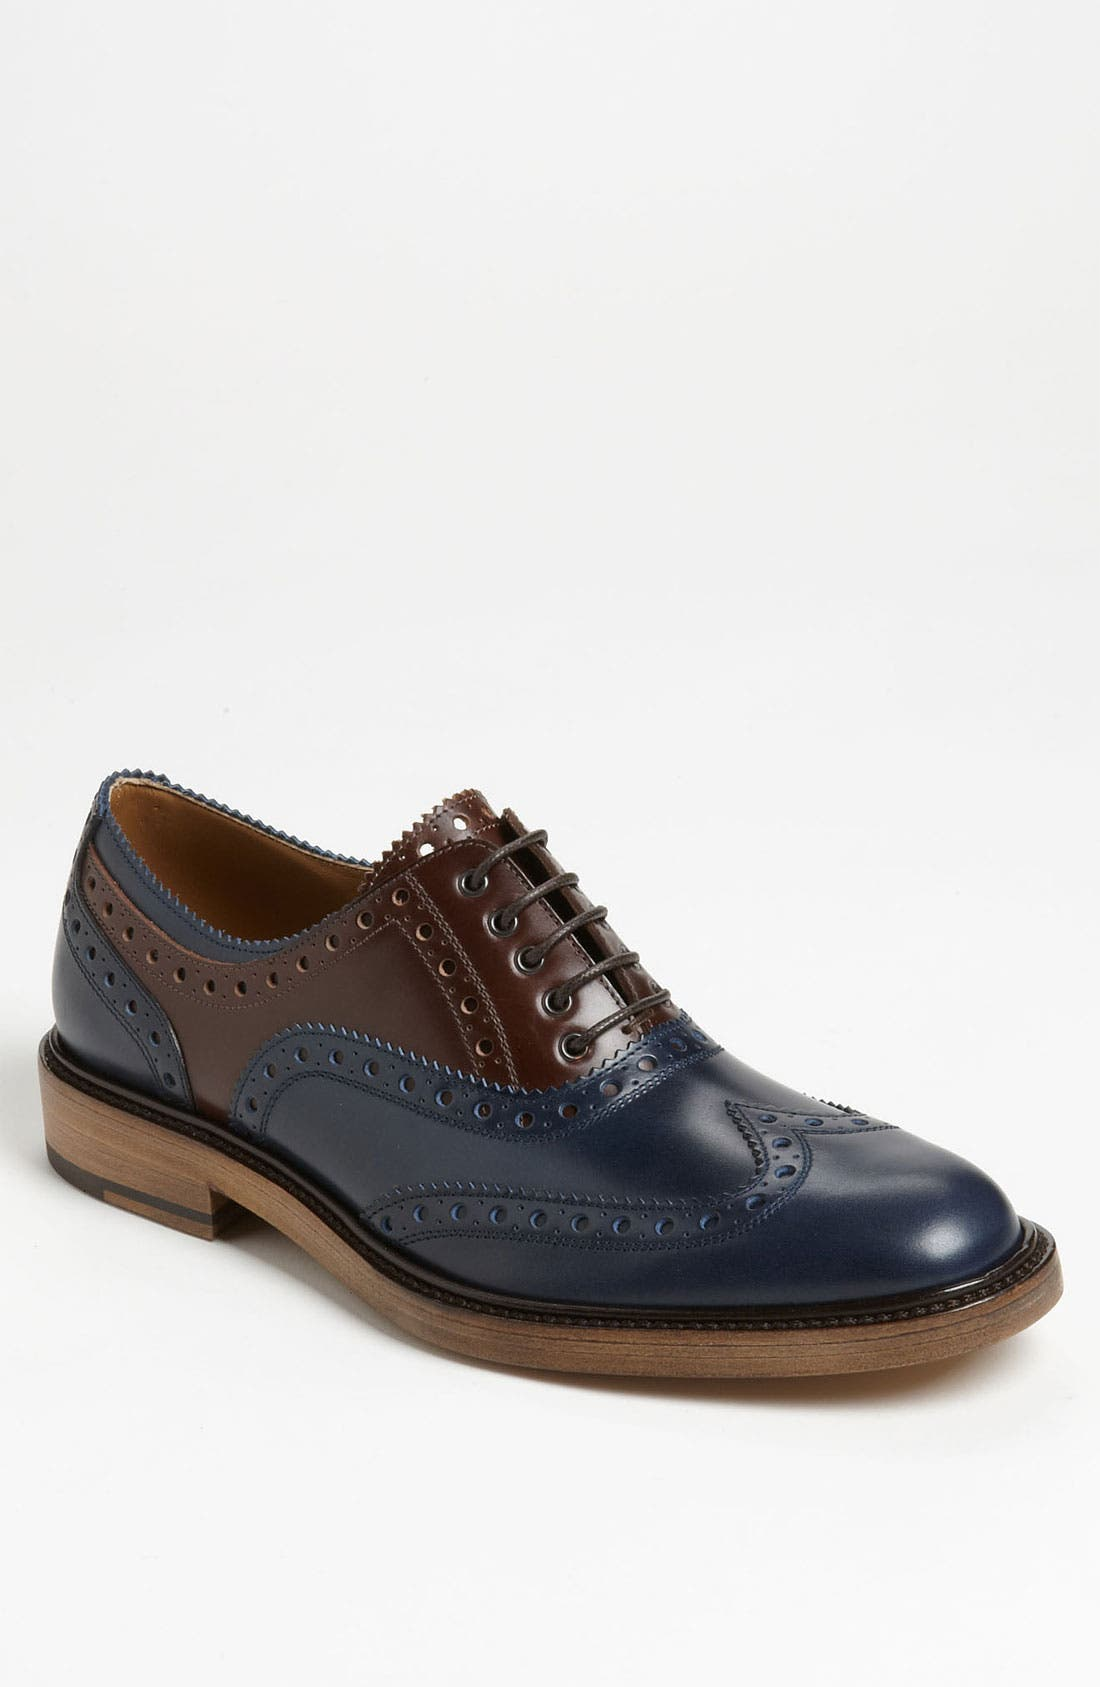 Main Image - Salvatore Ferragamo 'Tango' Spectator Shoe